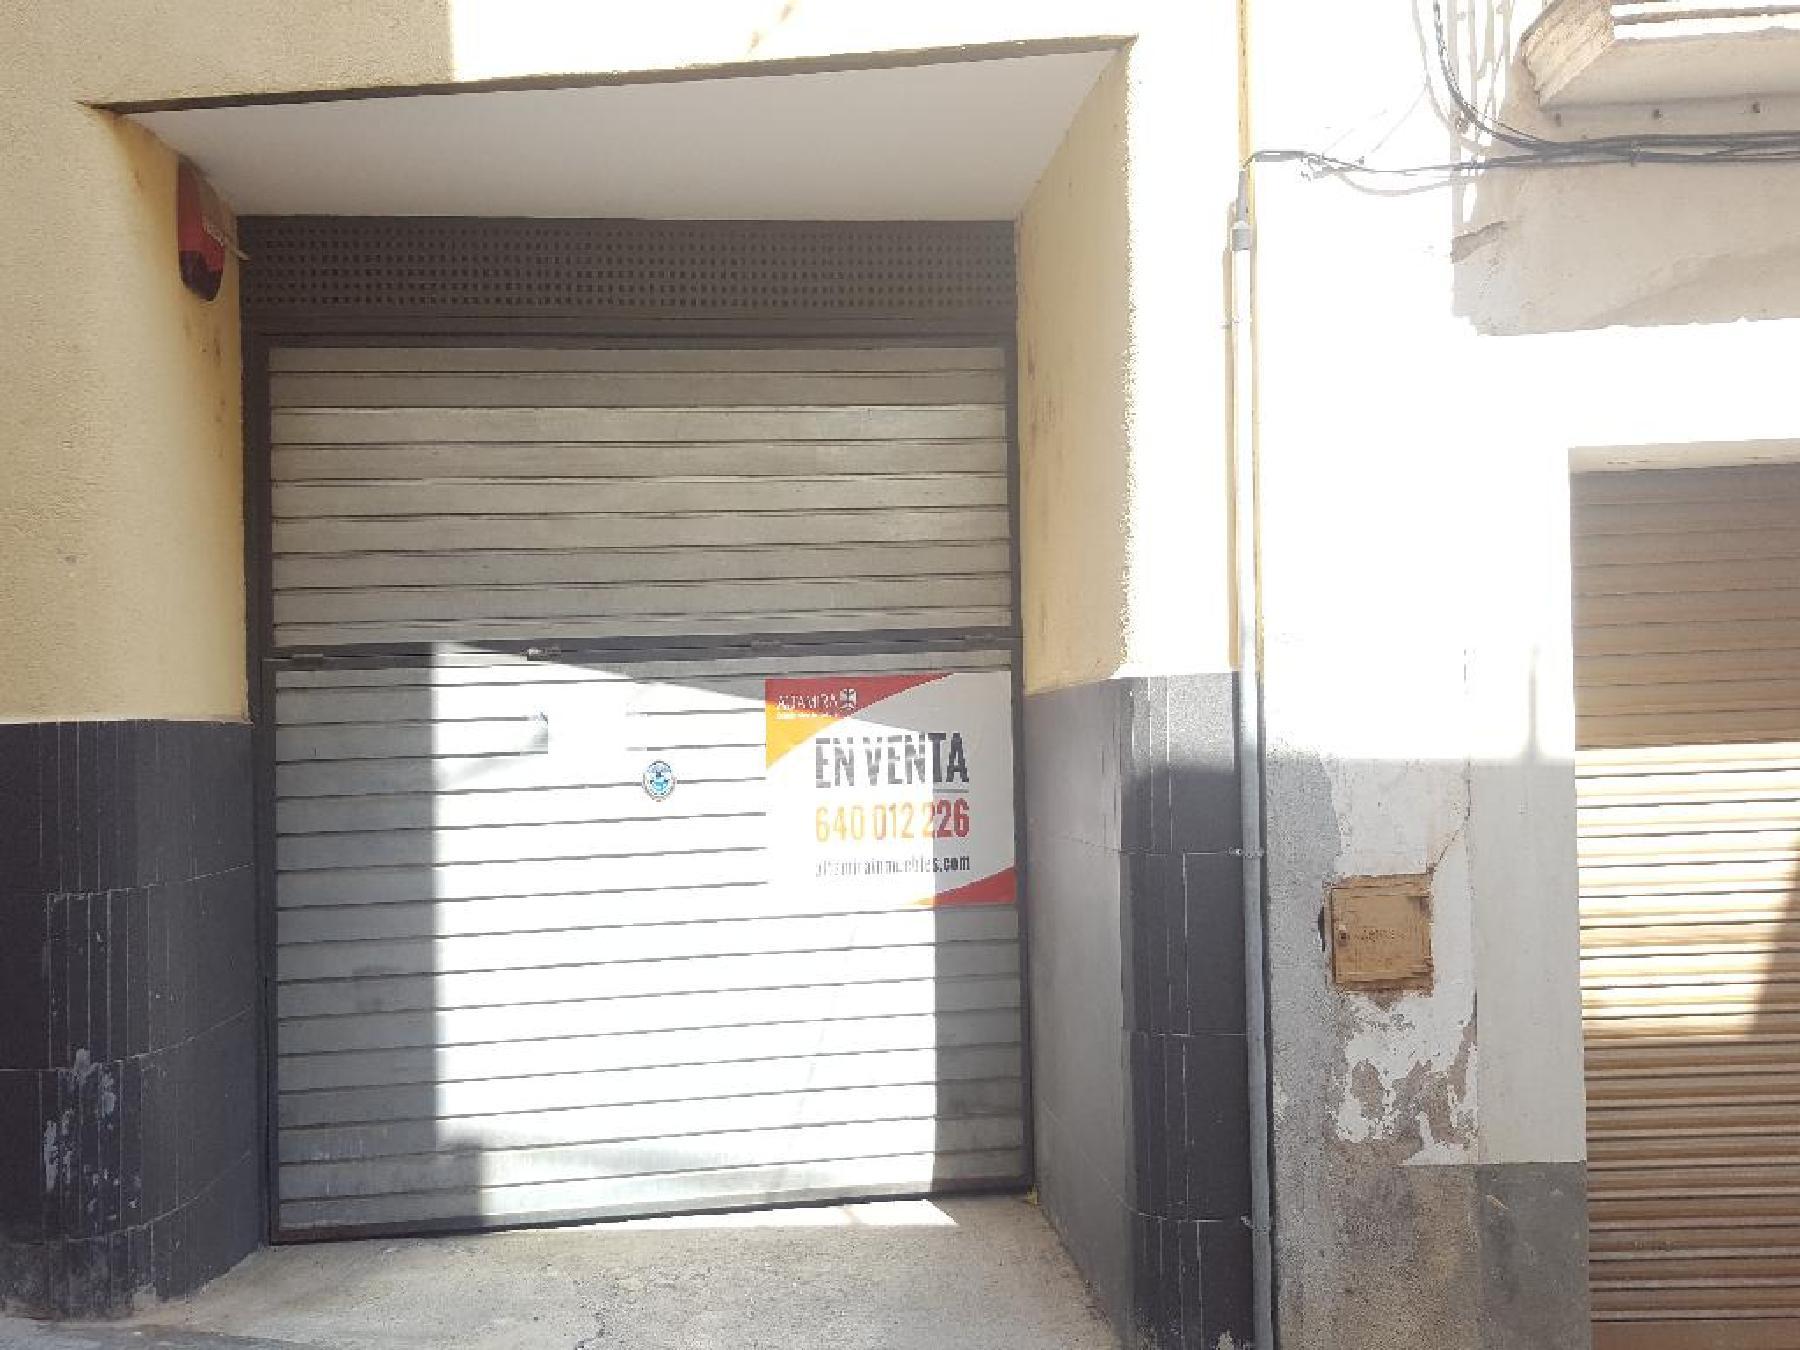 Car parking in Sant Llorenç d´Hortons